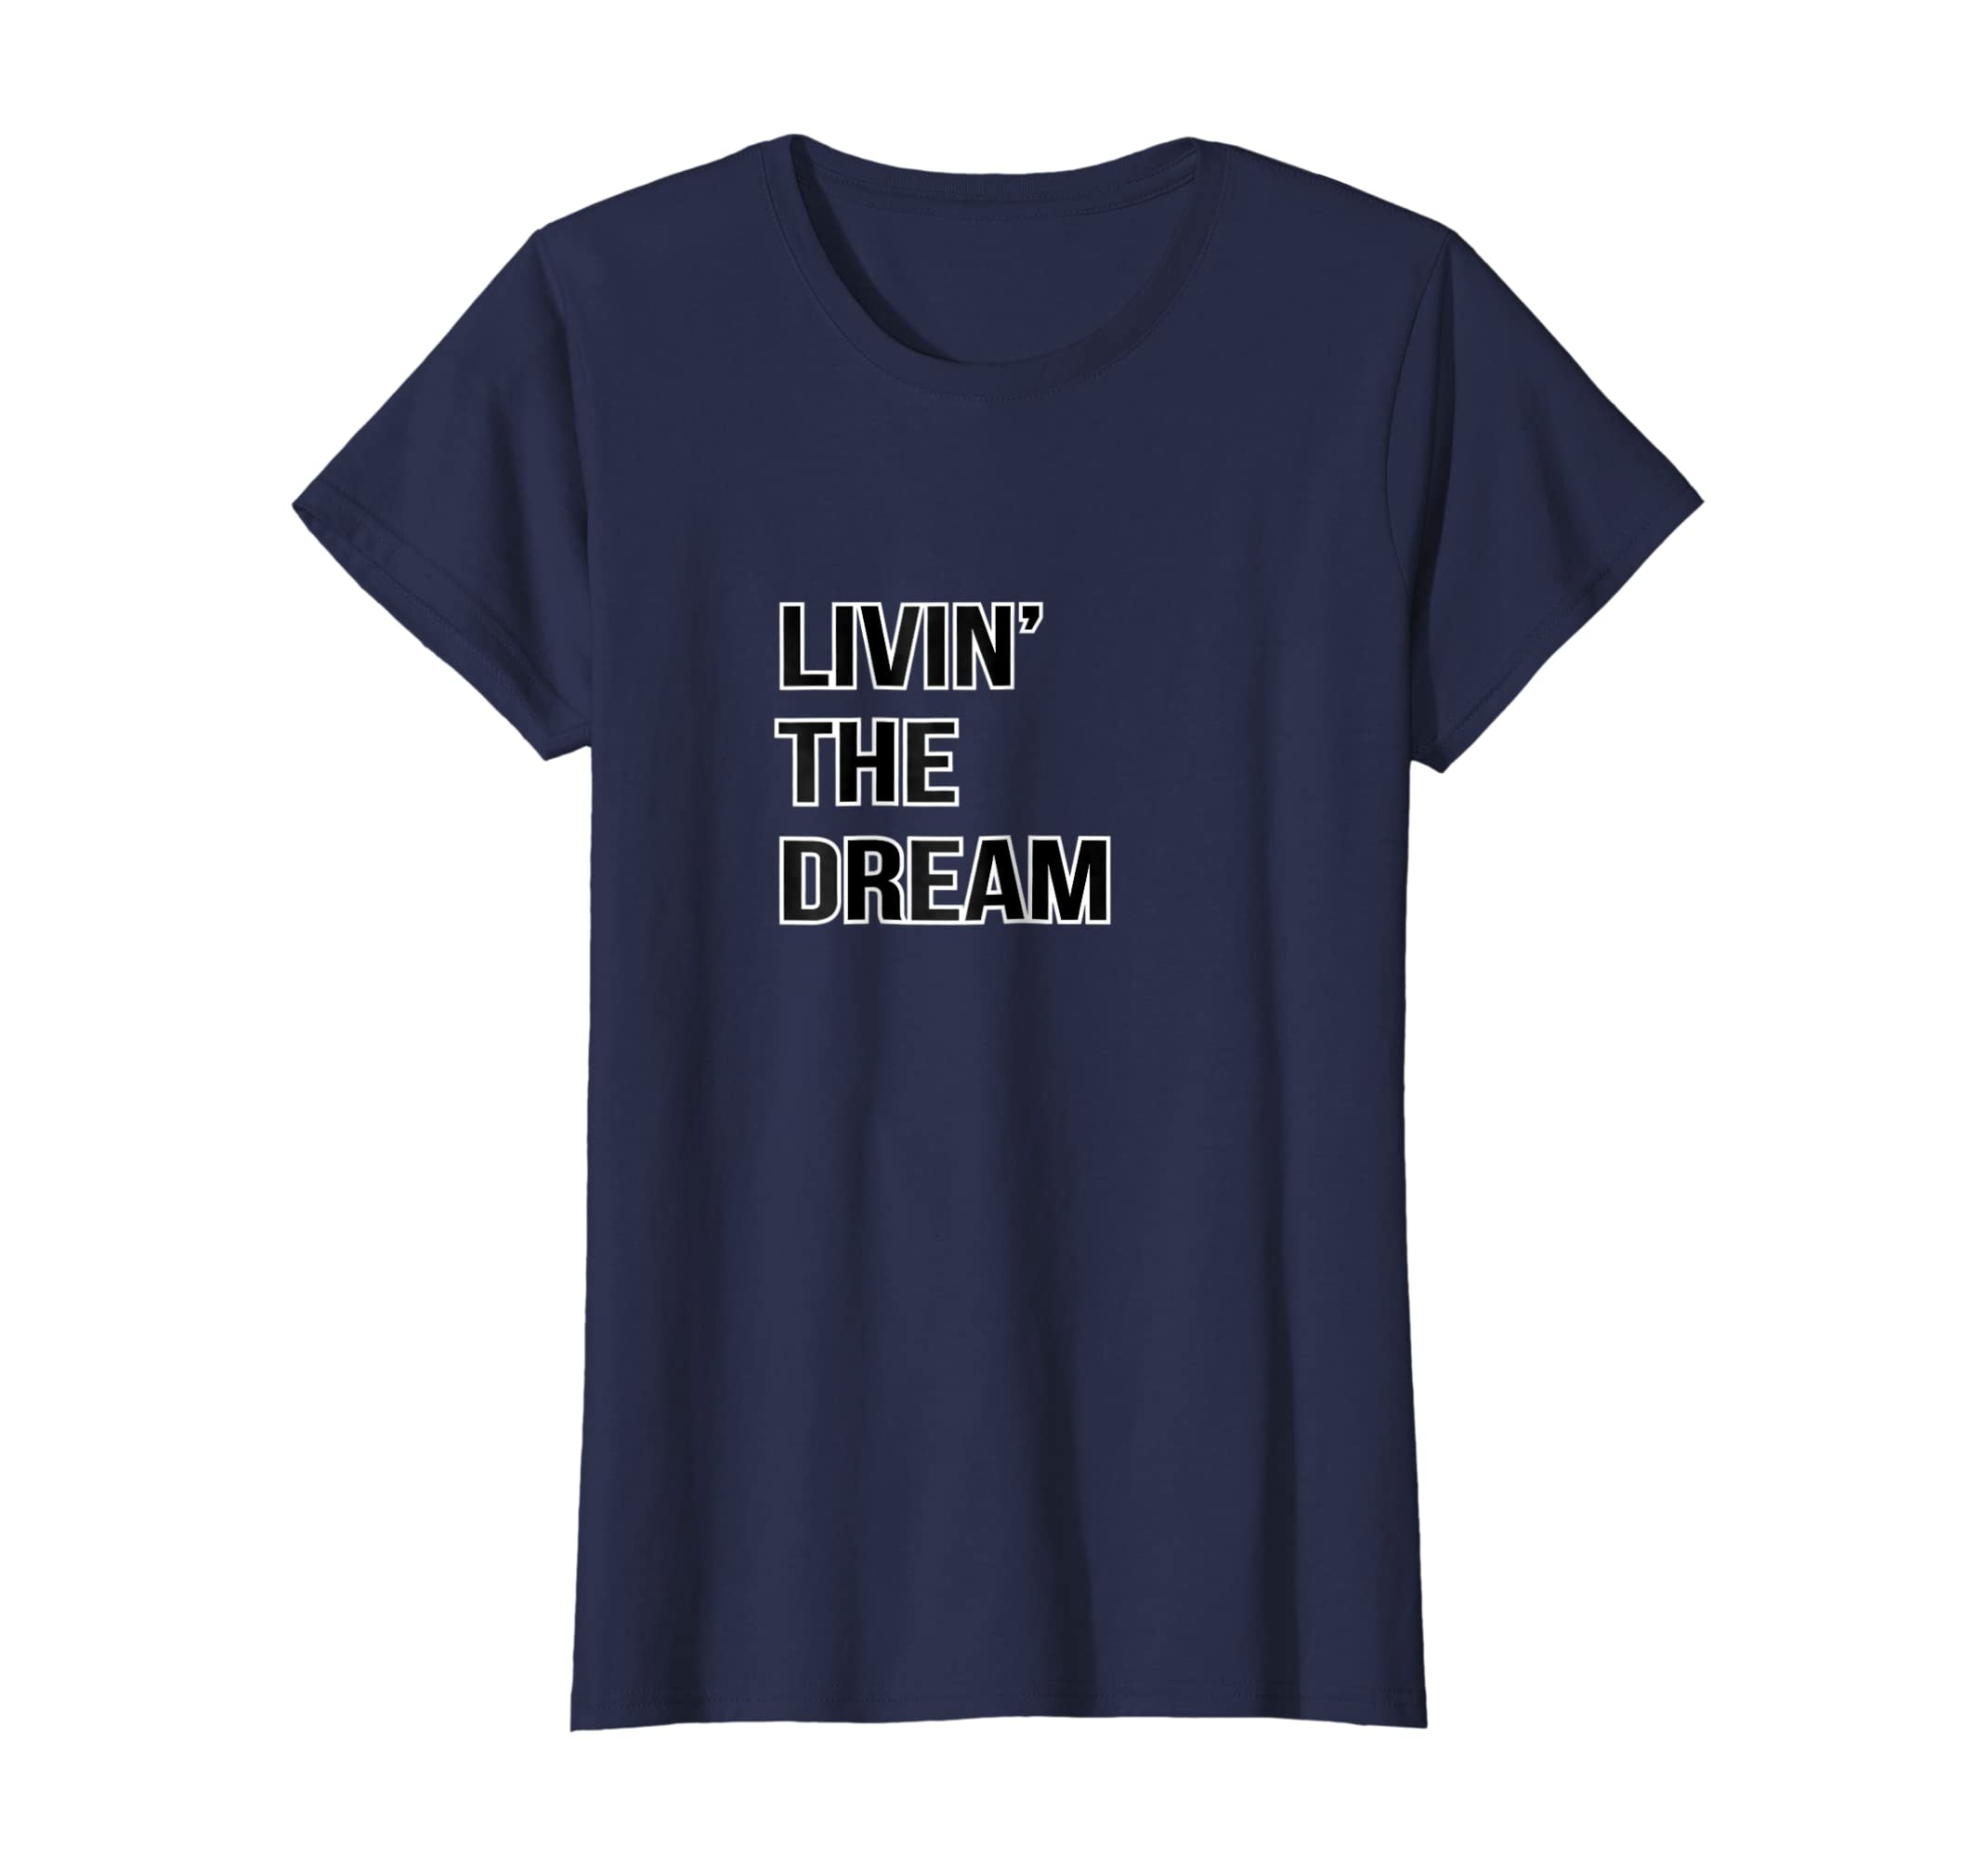 5f03764acb Amazon.com: Living The Dream T Shirt; Livin' The Dream; Men, Women Gift:  Clothing